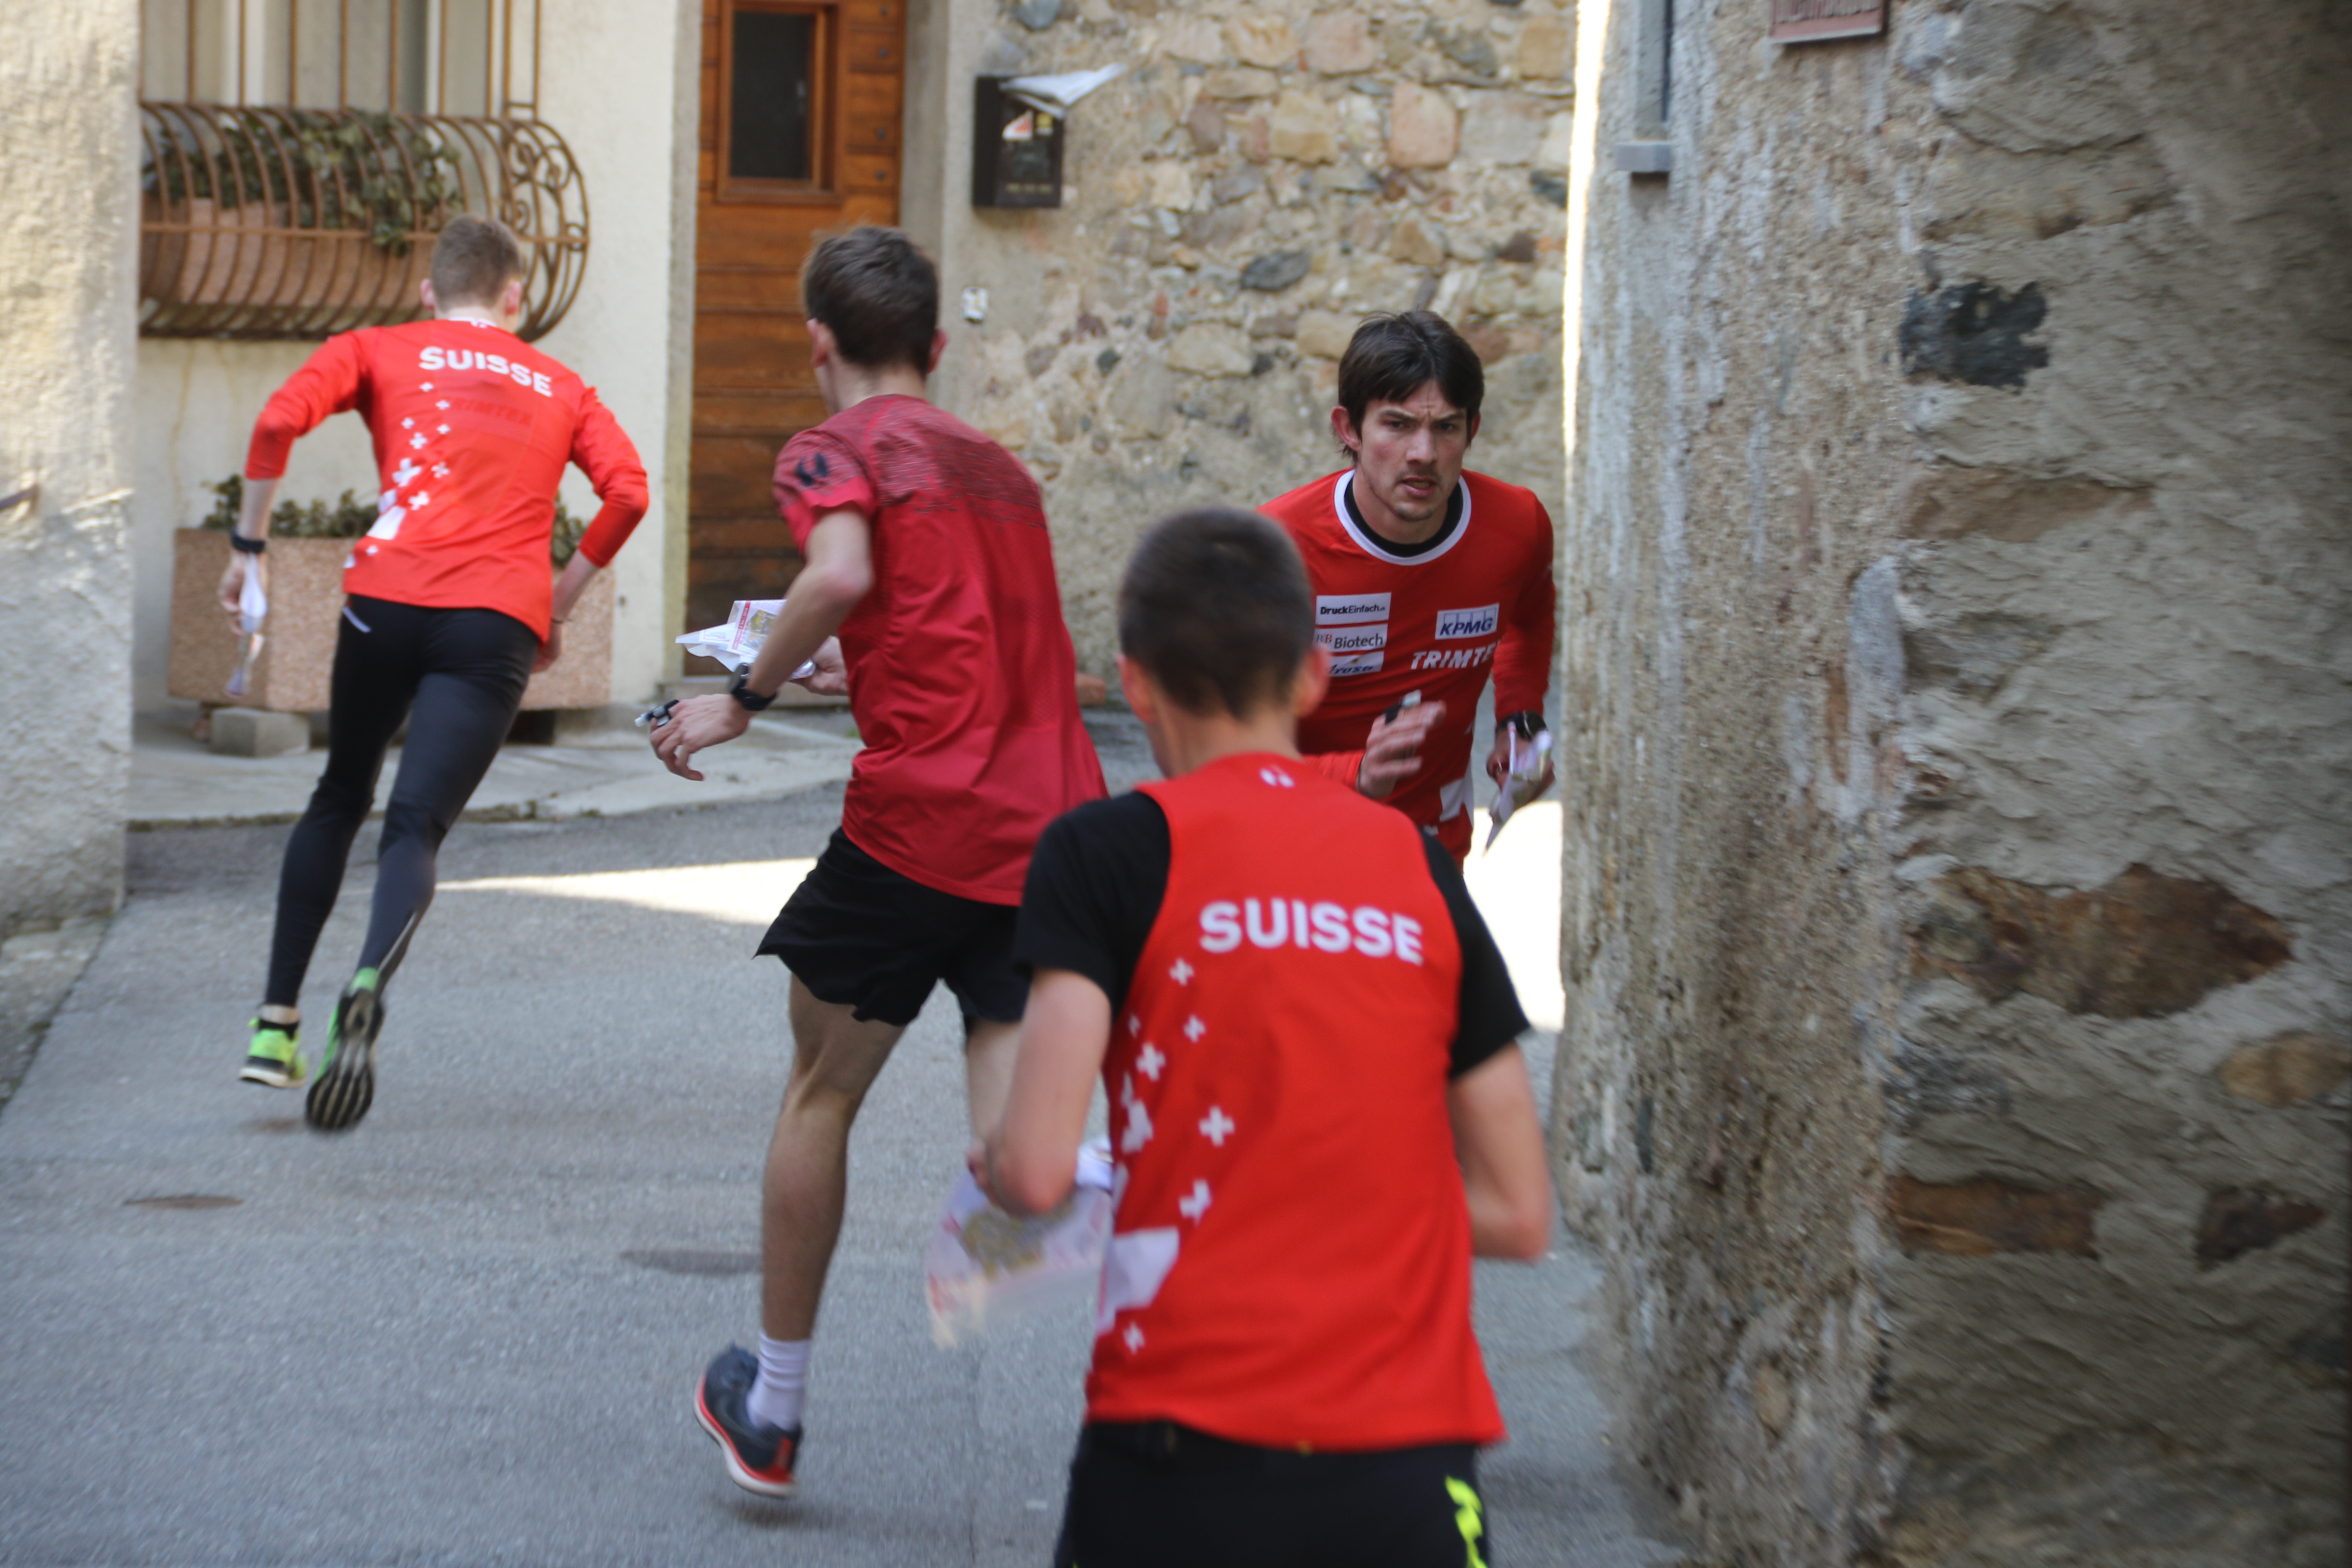 Relais sprint